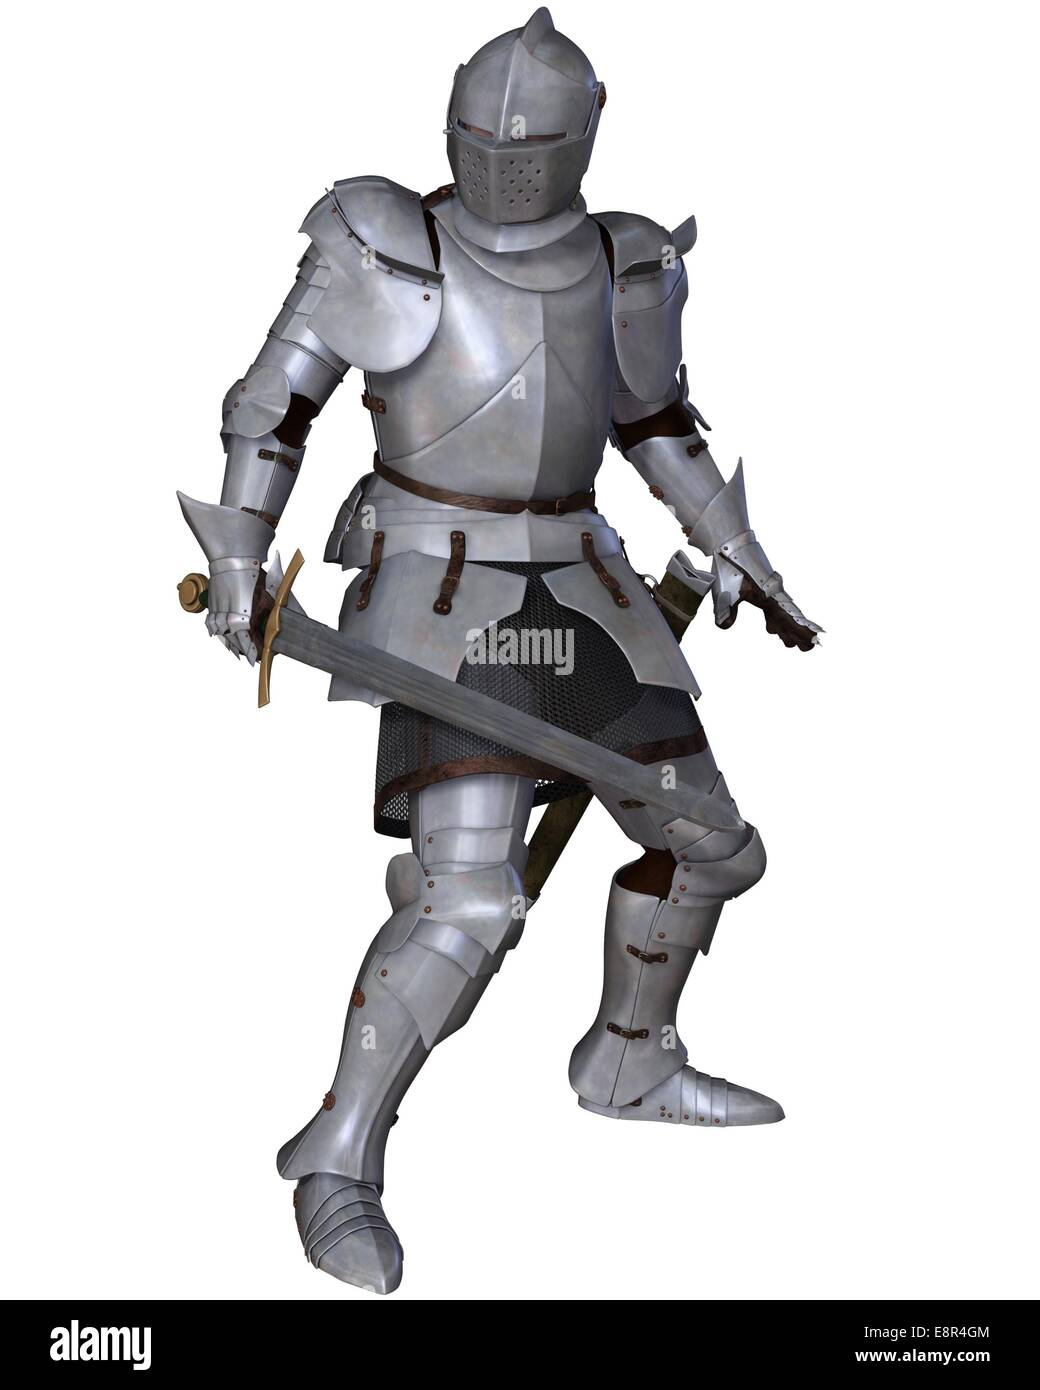 Medieval Knight 15th Century Stock Photos & Medieval Knight 15th ...